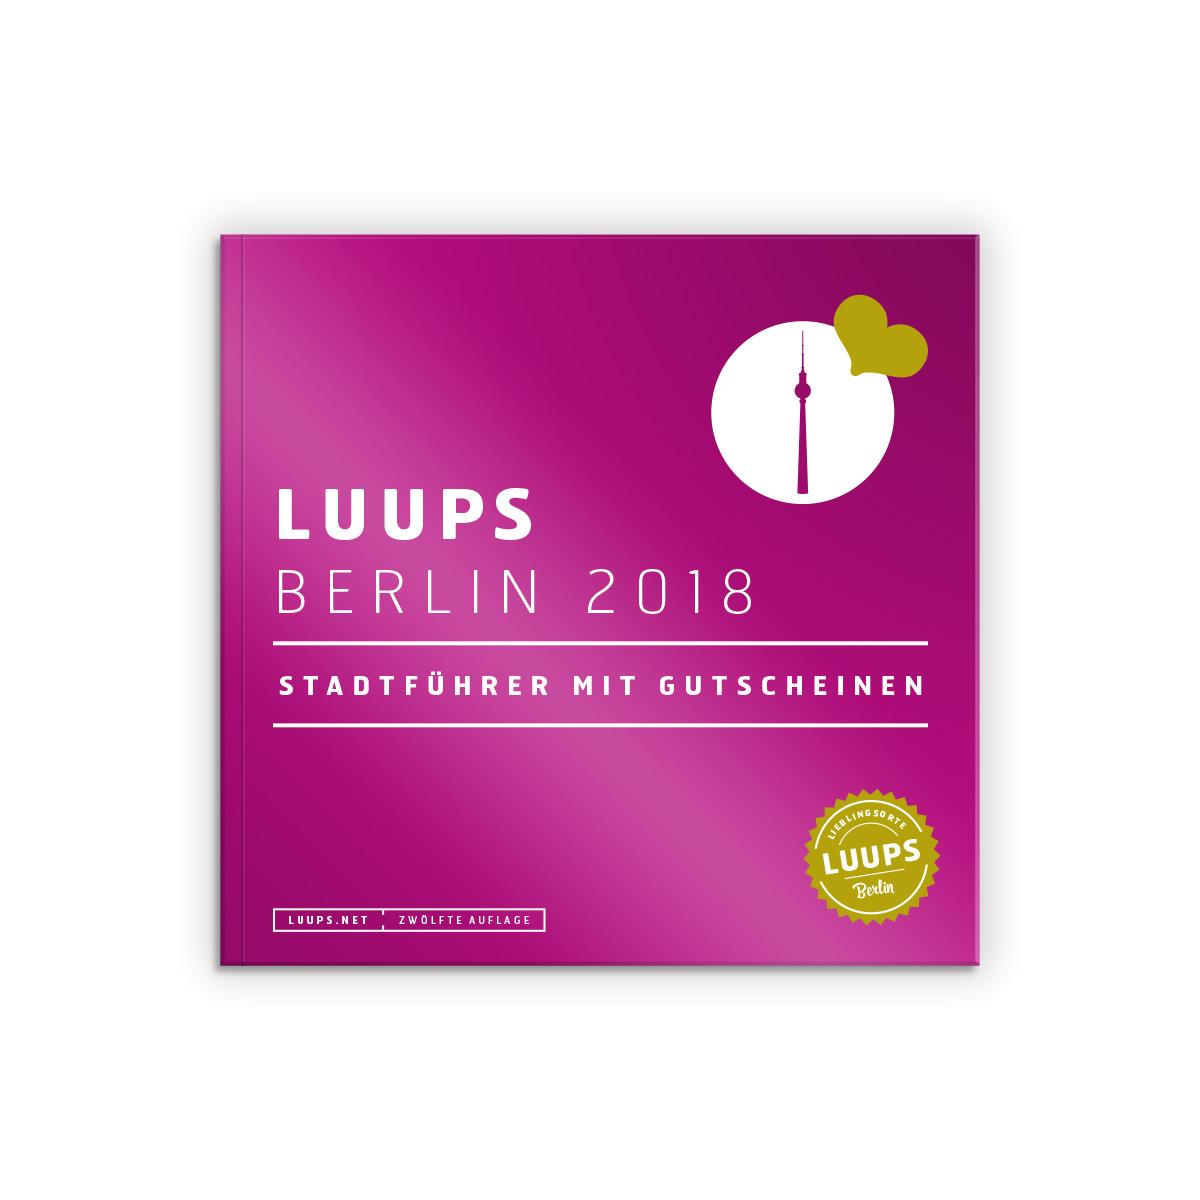 LUUPS Berlin 2018 -  -  4250654807326